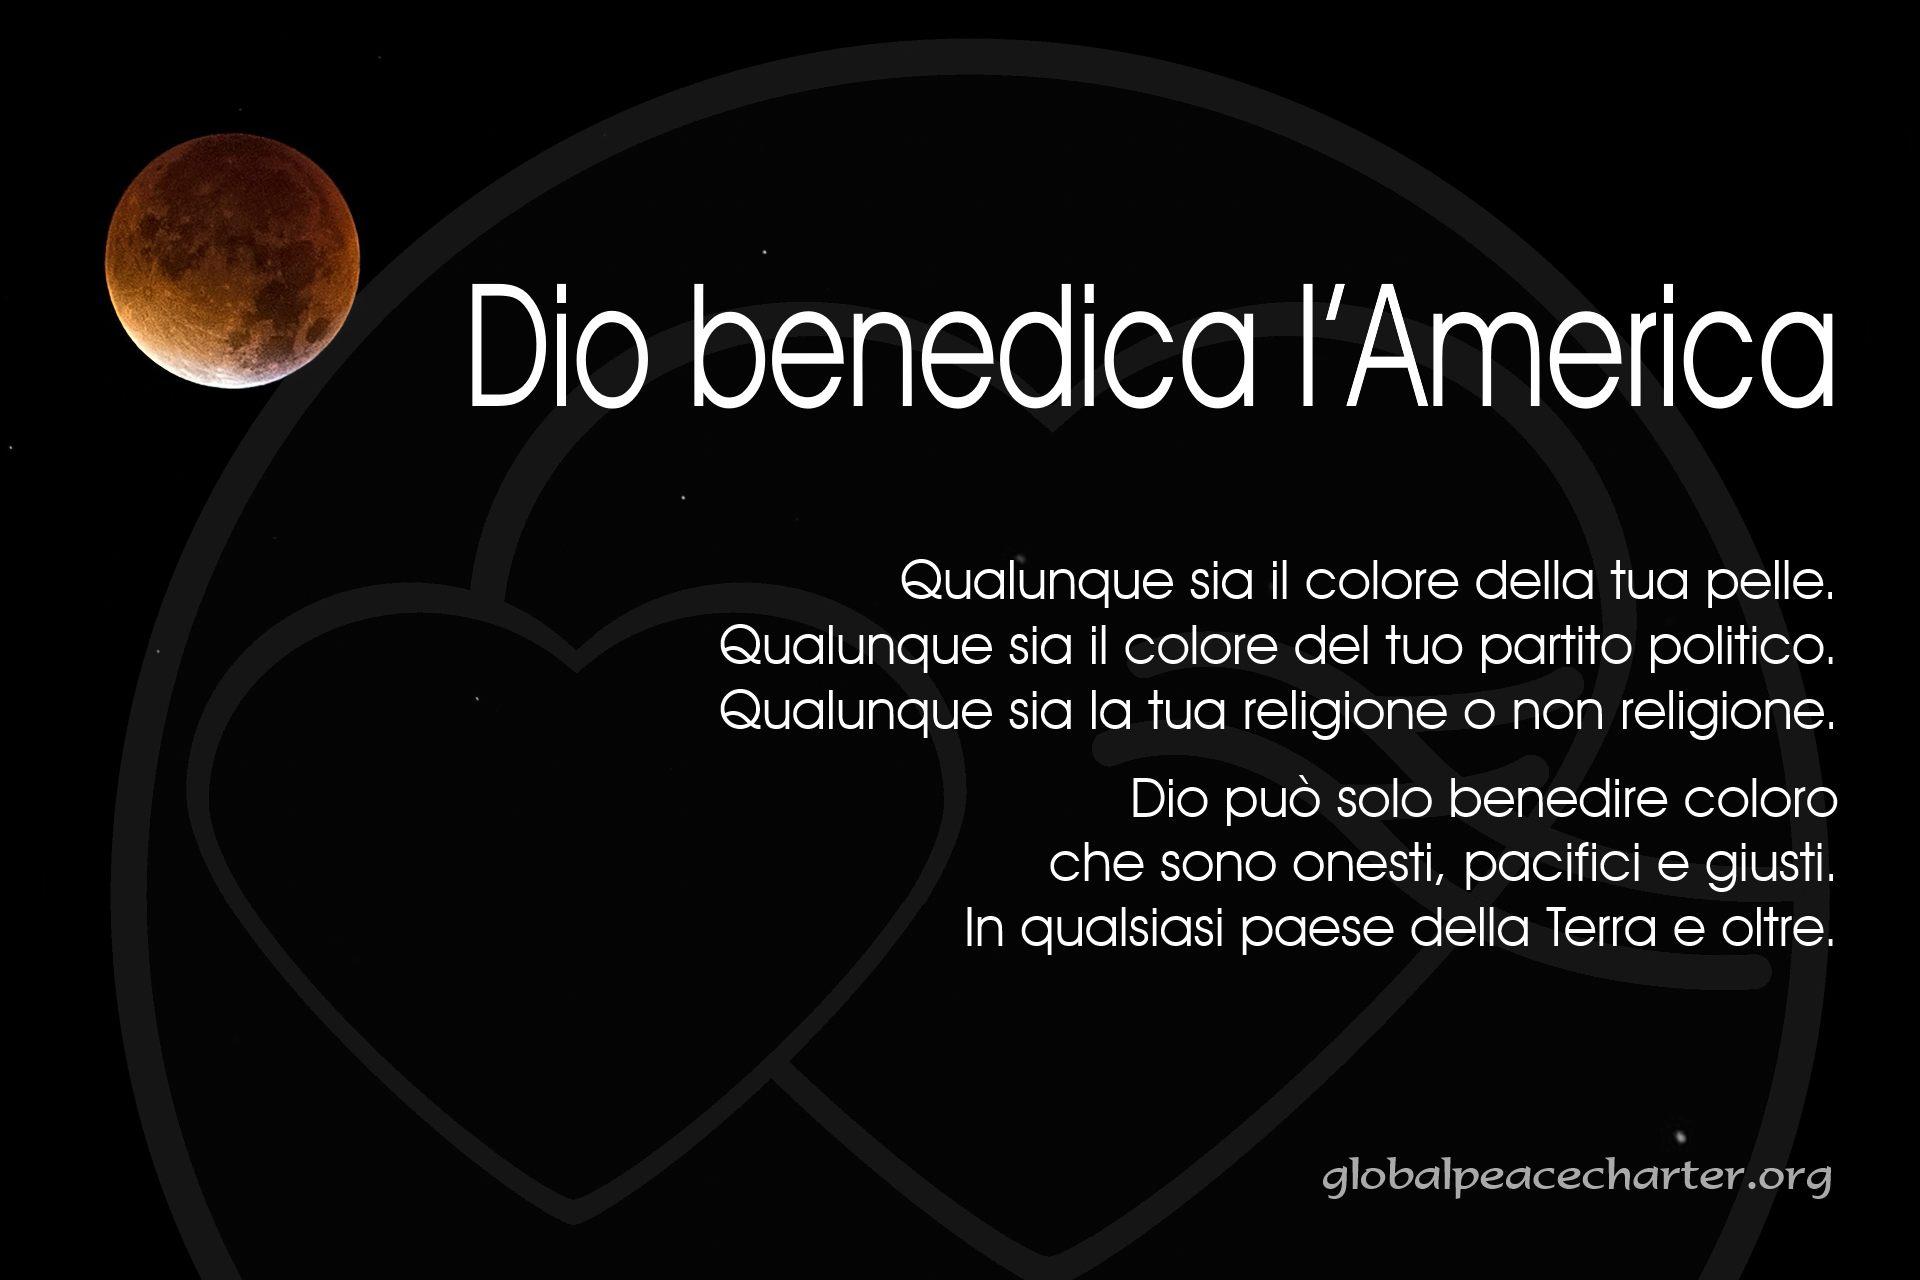 Dio benedica l'America